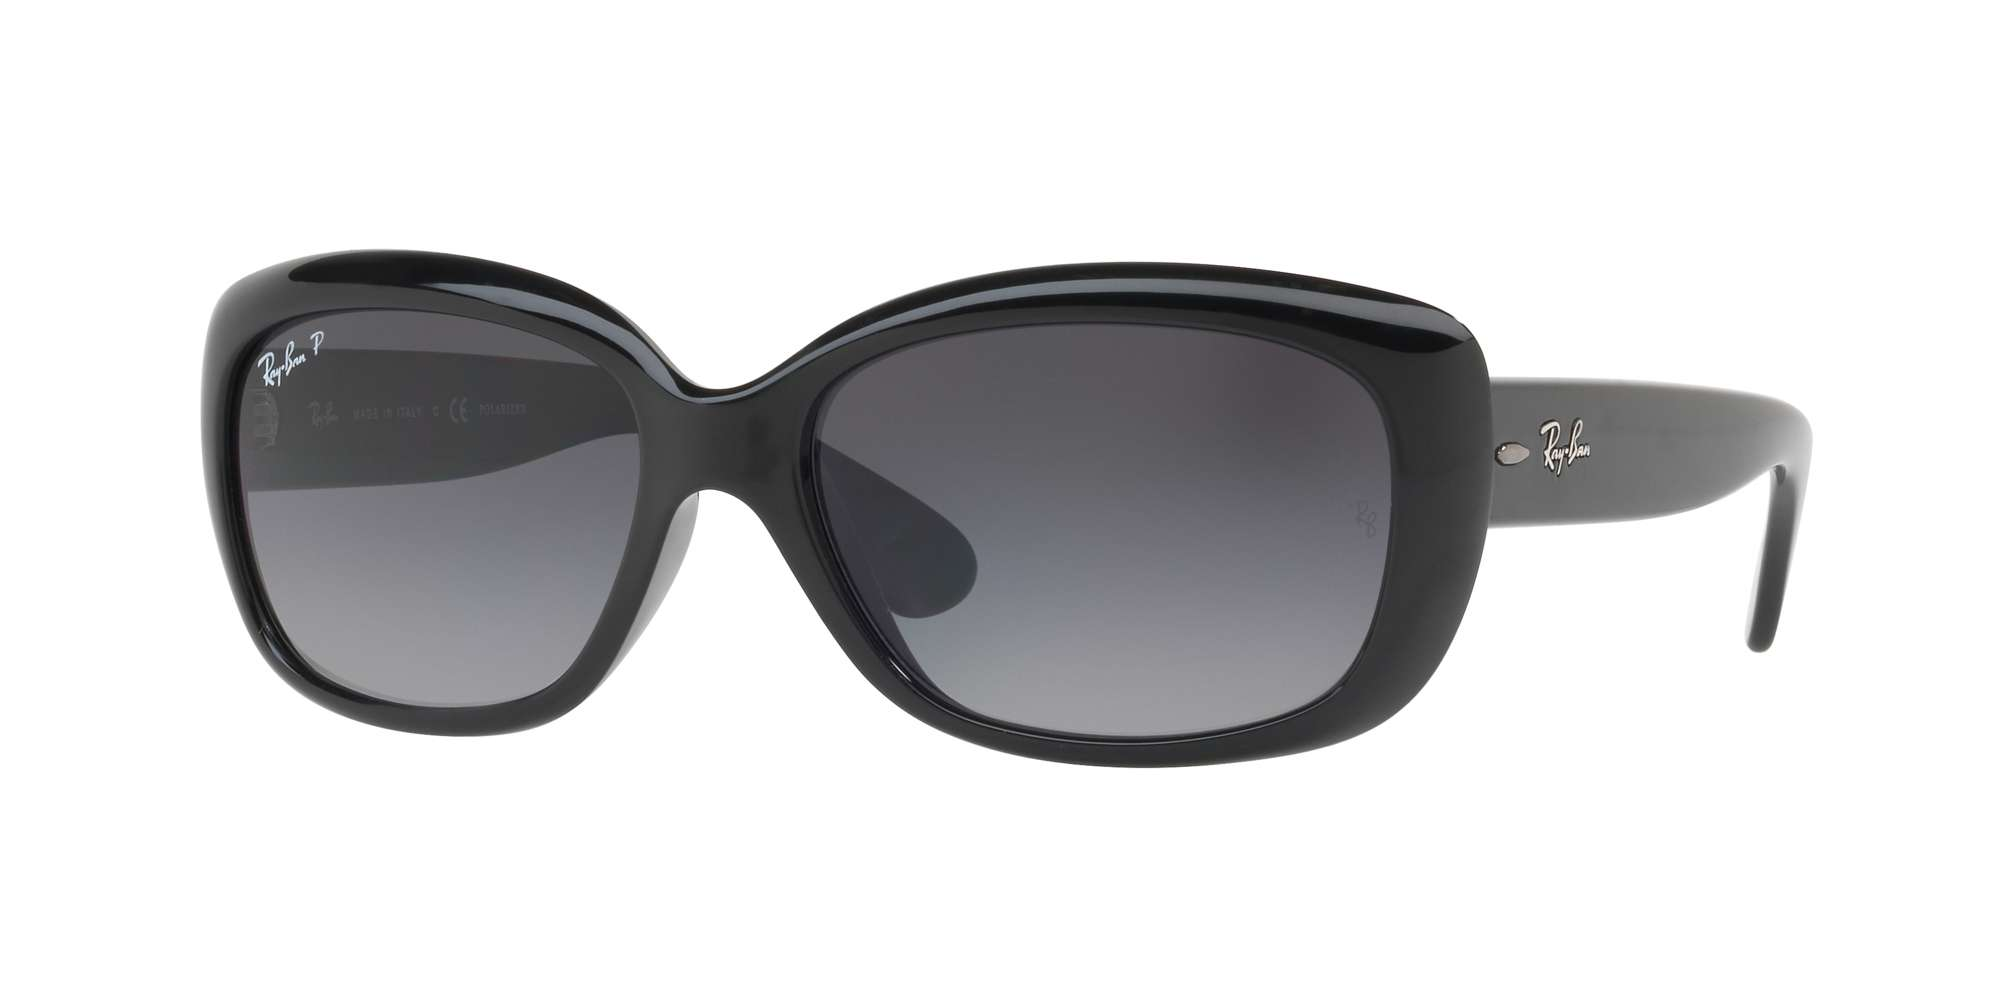 SHINY BLACK / GREY GRADIENT DARK GREY POLAR lenses